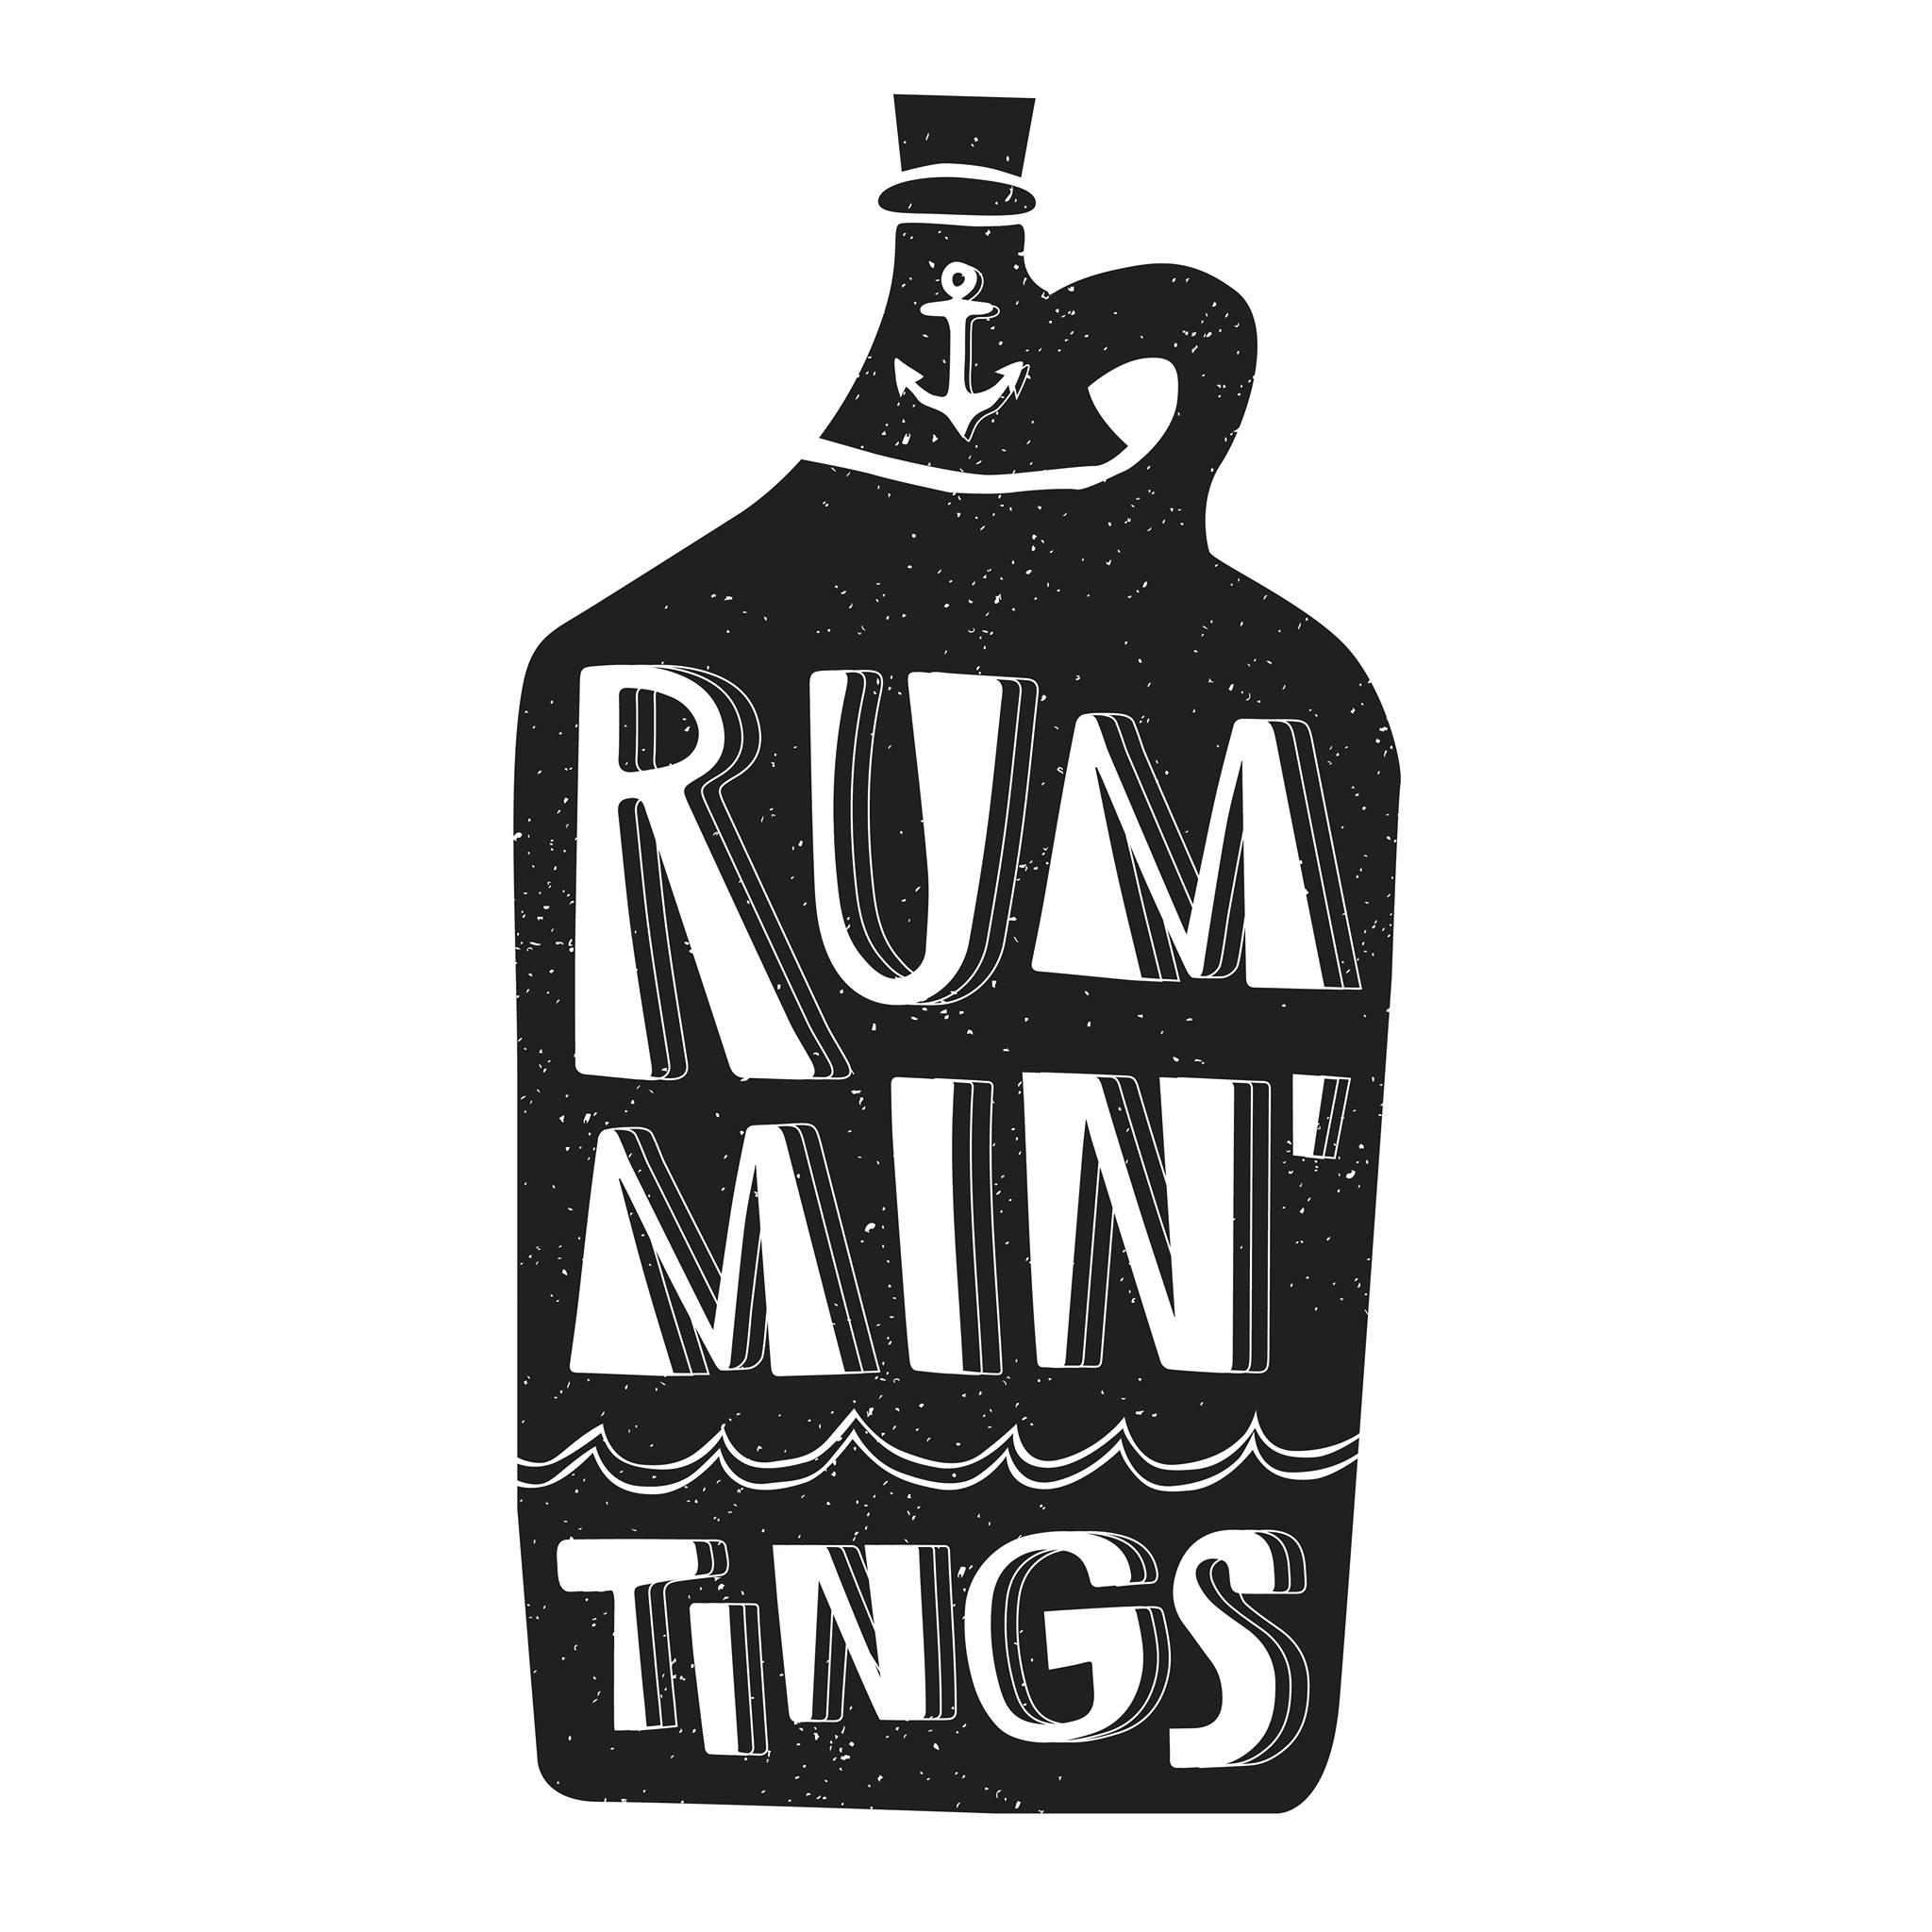 Rummin's Tings